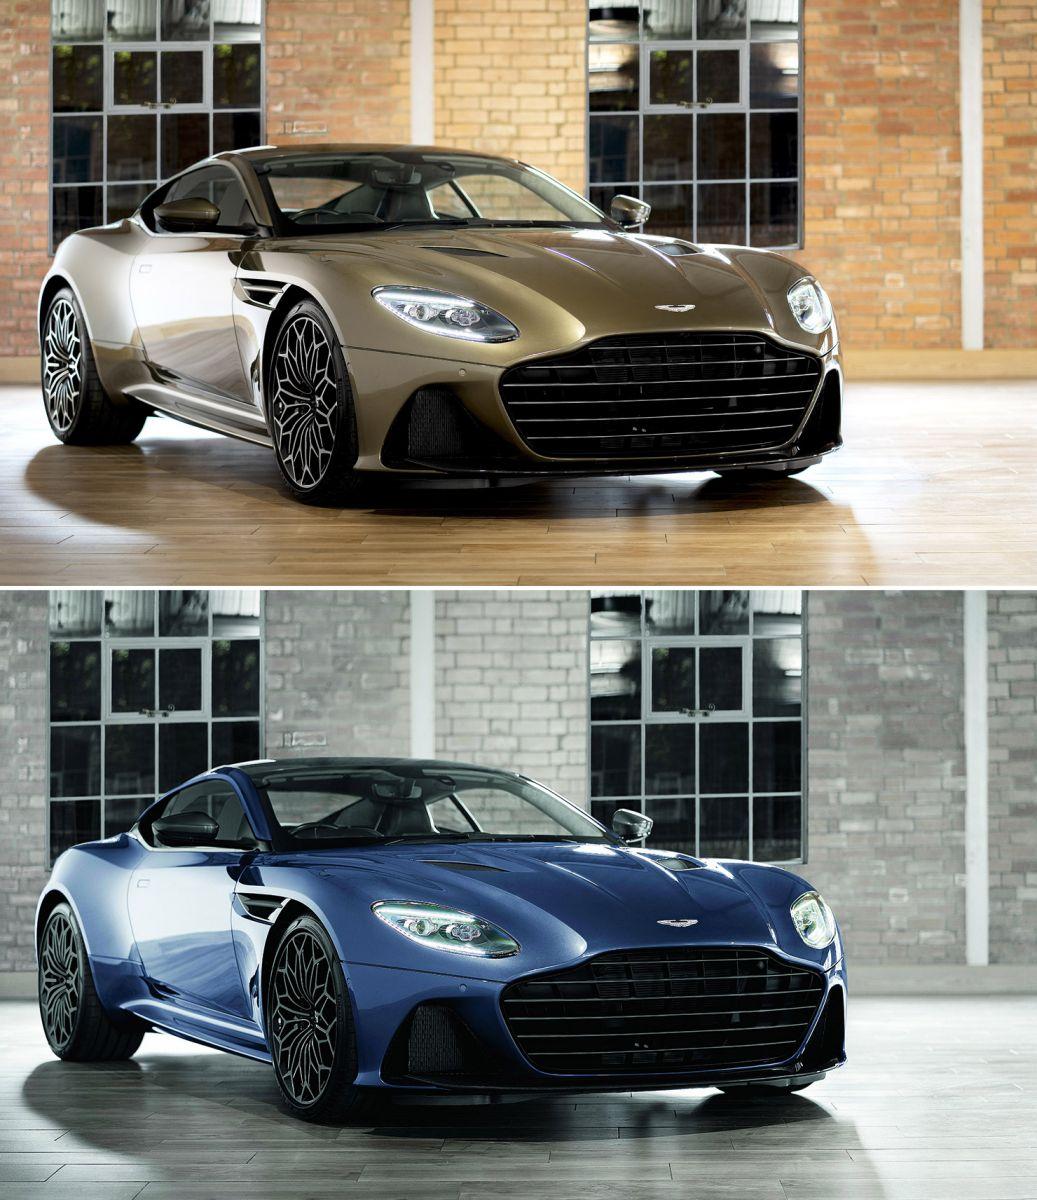 Neiman Marcus Fantasy Gifts Aston Martin Dbs Superleggera Designed By Daniel Craig And Platinum Omega Seamaster Limited Edition Freddythefox Net